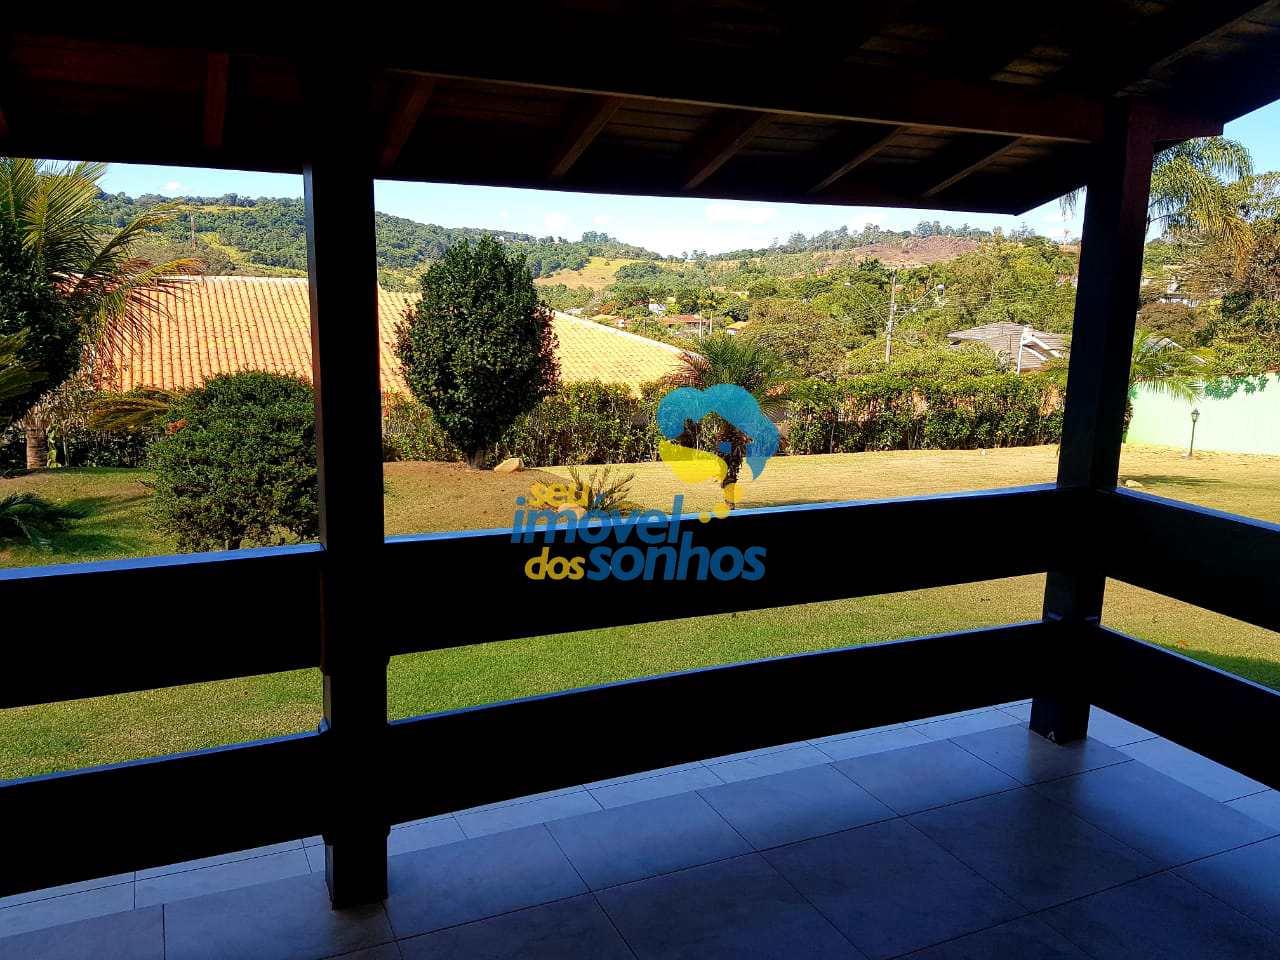 Casa de Condomínio com 3 dorms, Condomínio Residencial Vila Rica, Bragança Paulista - R$ 1.35 mi, Cod: 66